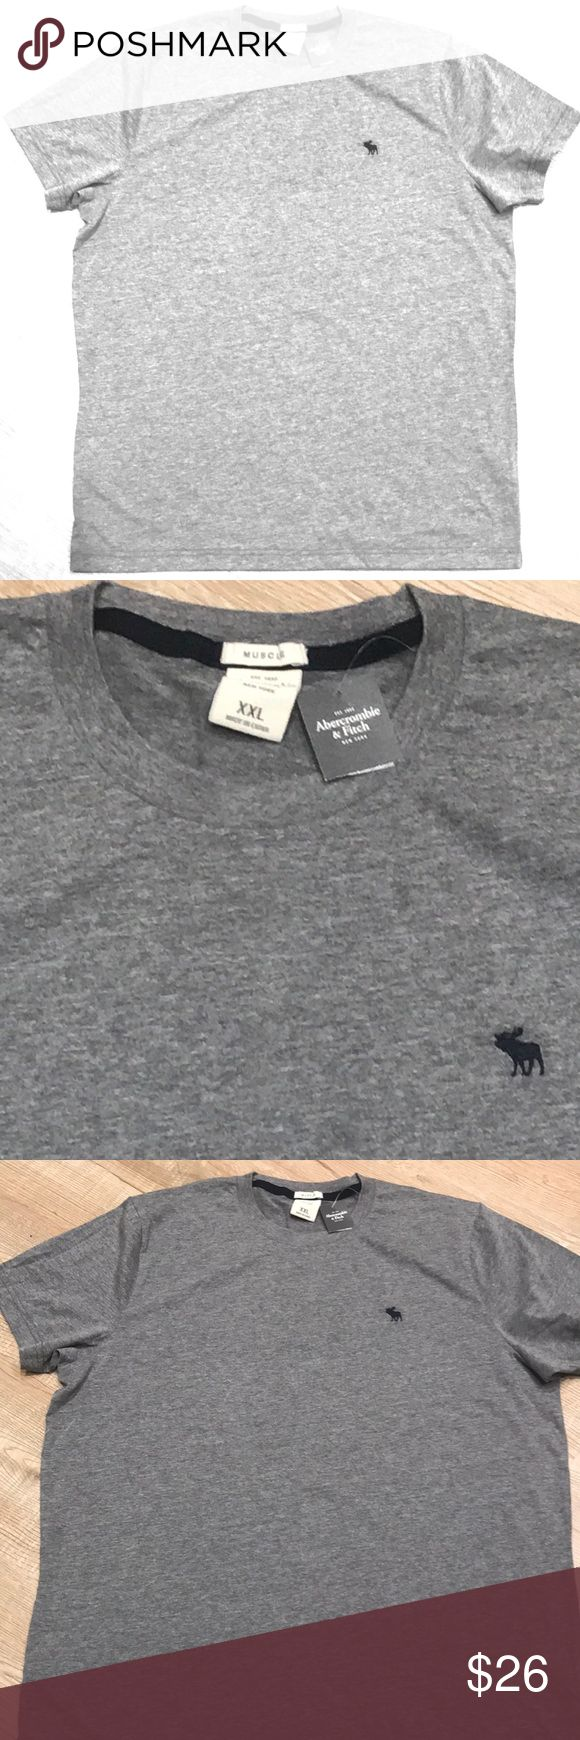 Abercrombie men's Gray T-Shirt Brand new men's Abercrombie Gray T-shirt.  Great for a casual day! Look stylish! Abercrombie & Fitch Shirts Tees - Short Sleeve